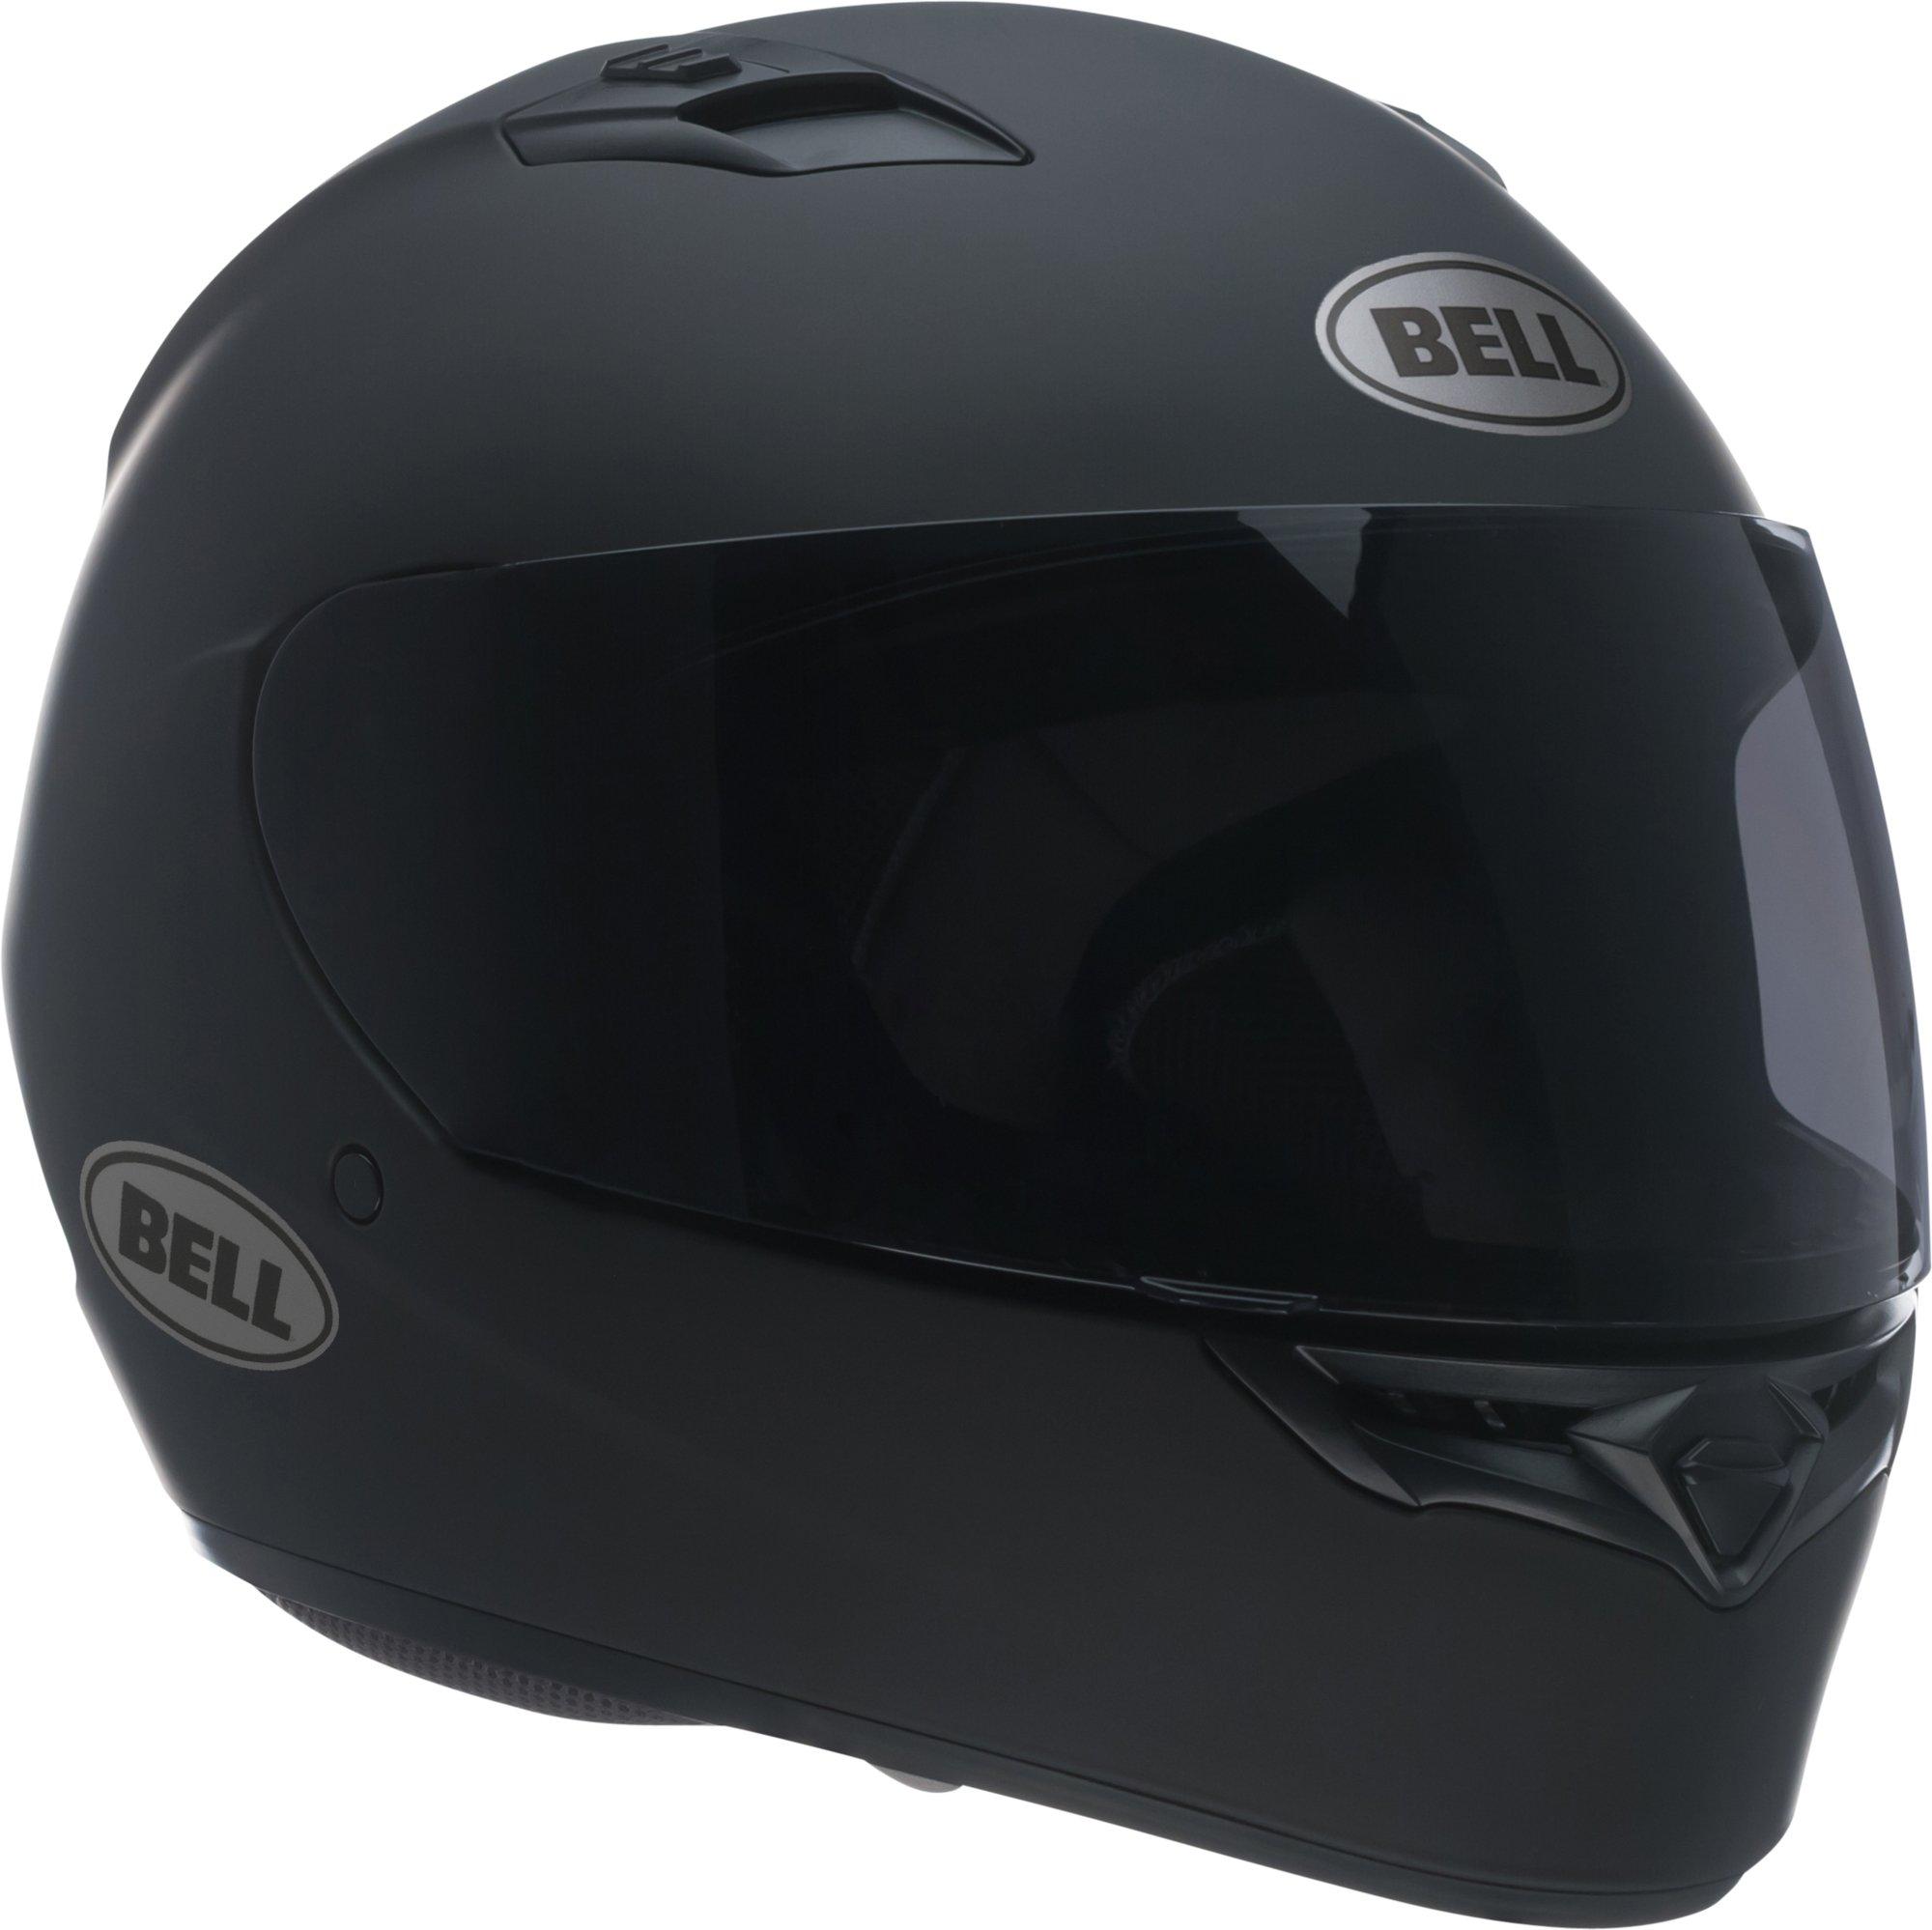 Bell Unisex Adult Solid Matte Black Qualifier Full Face Helmet 7049223